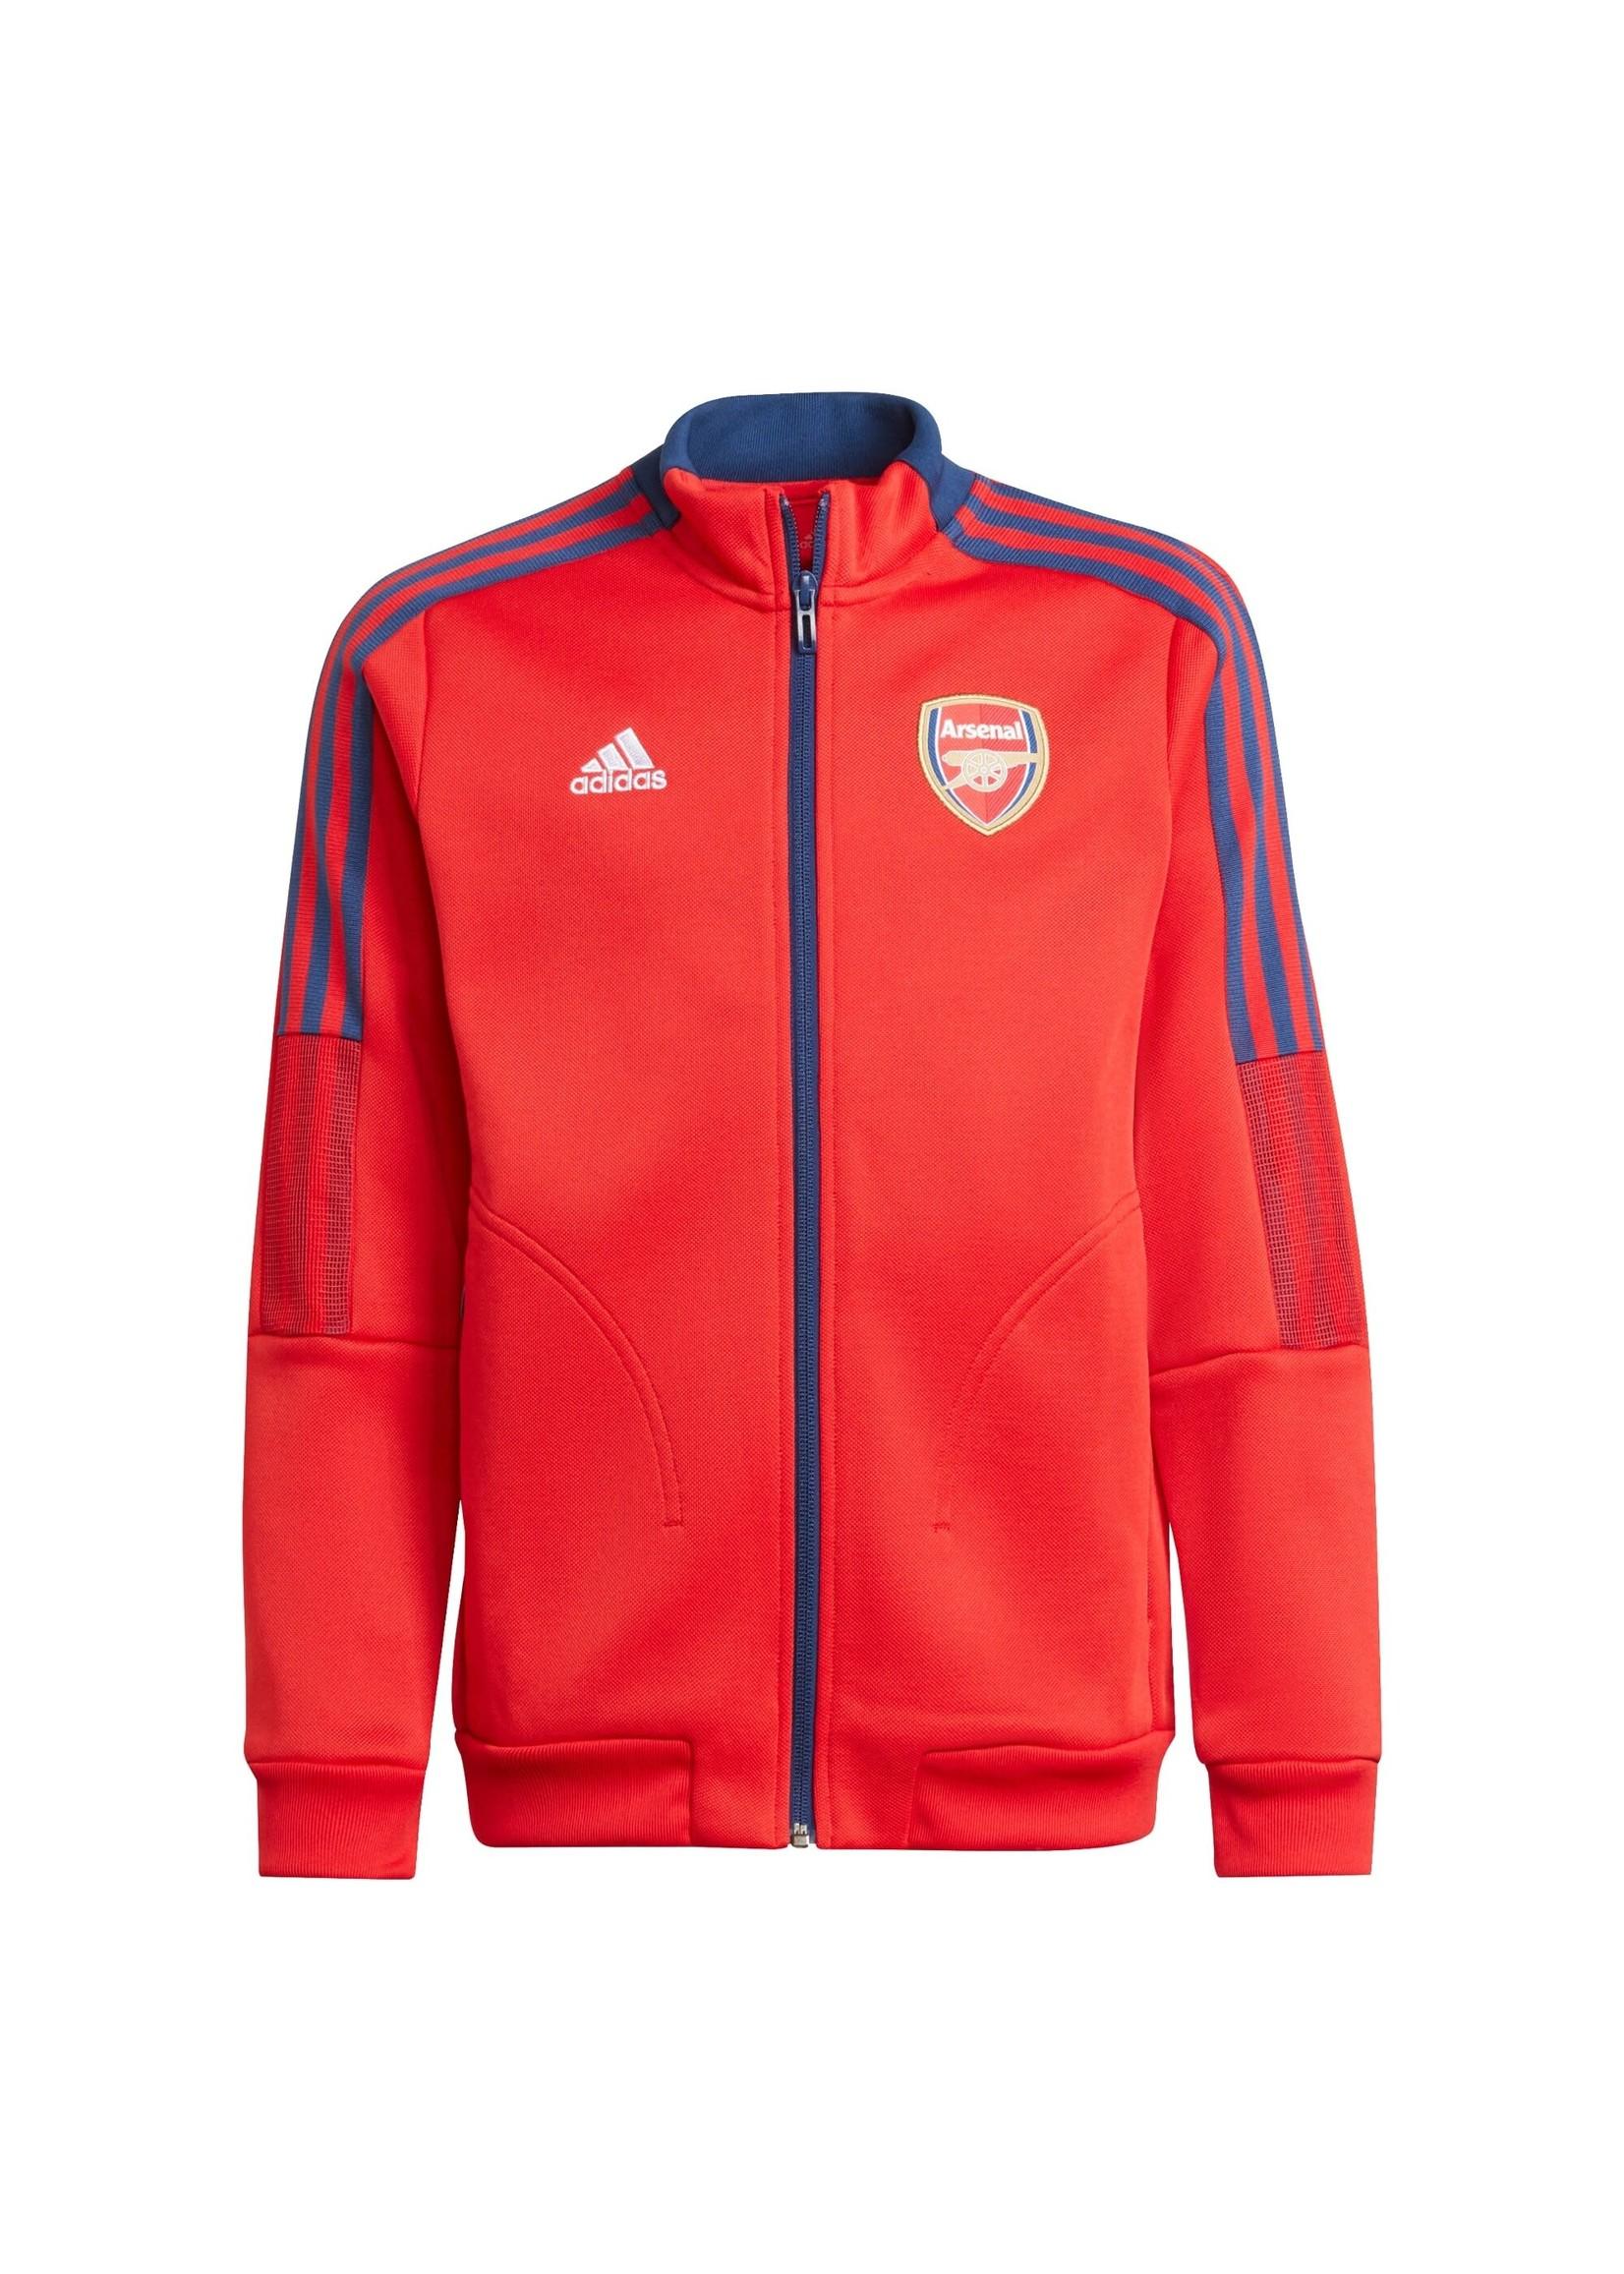 Adidas ARSENAL ANTHEM JACKET 2021/22